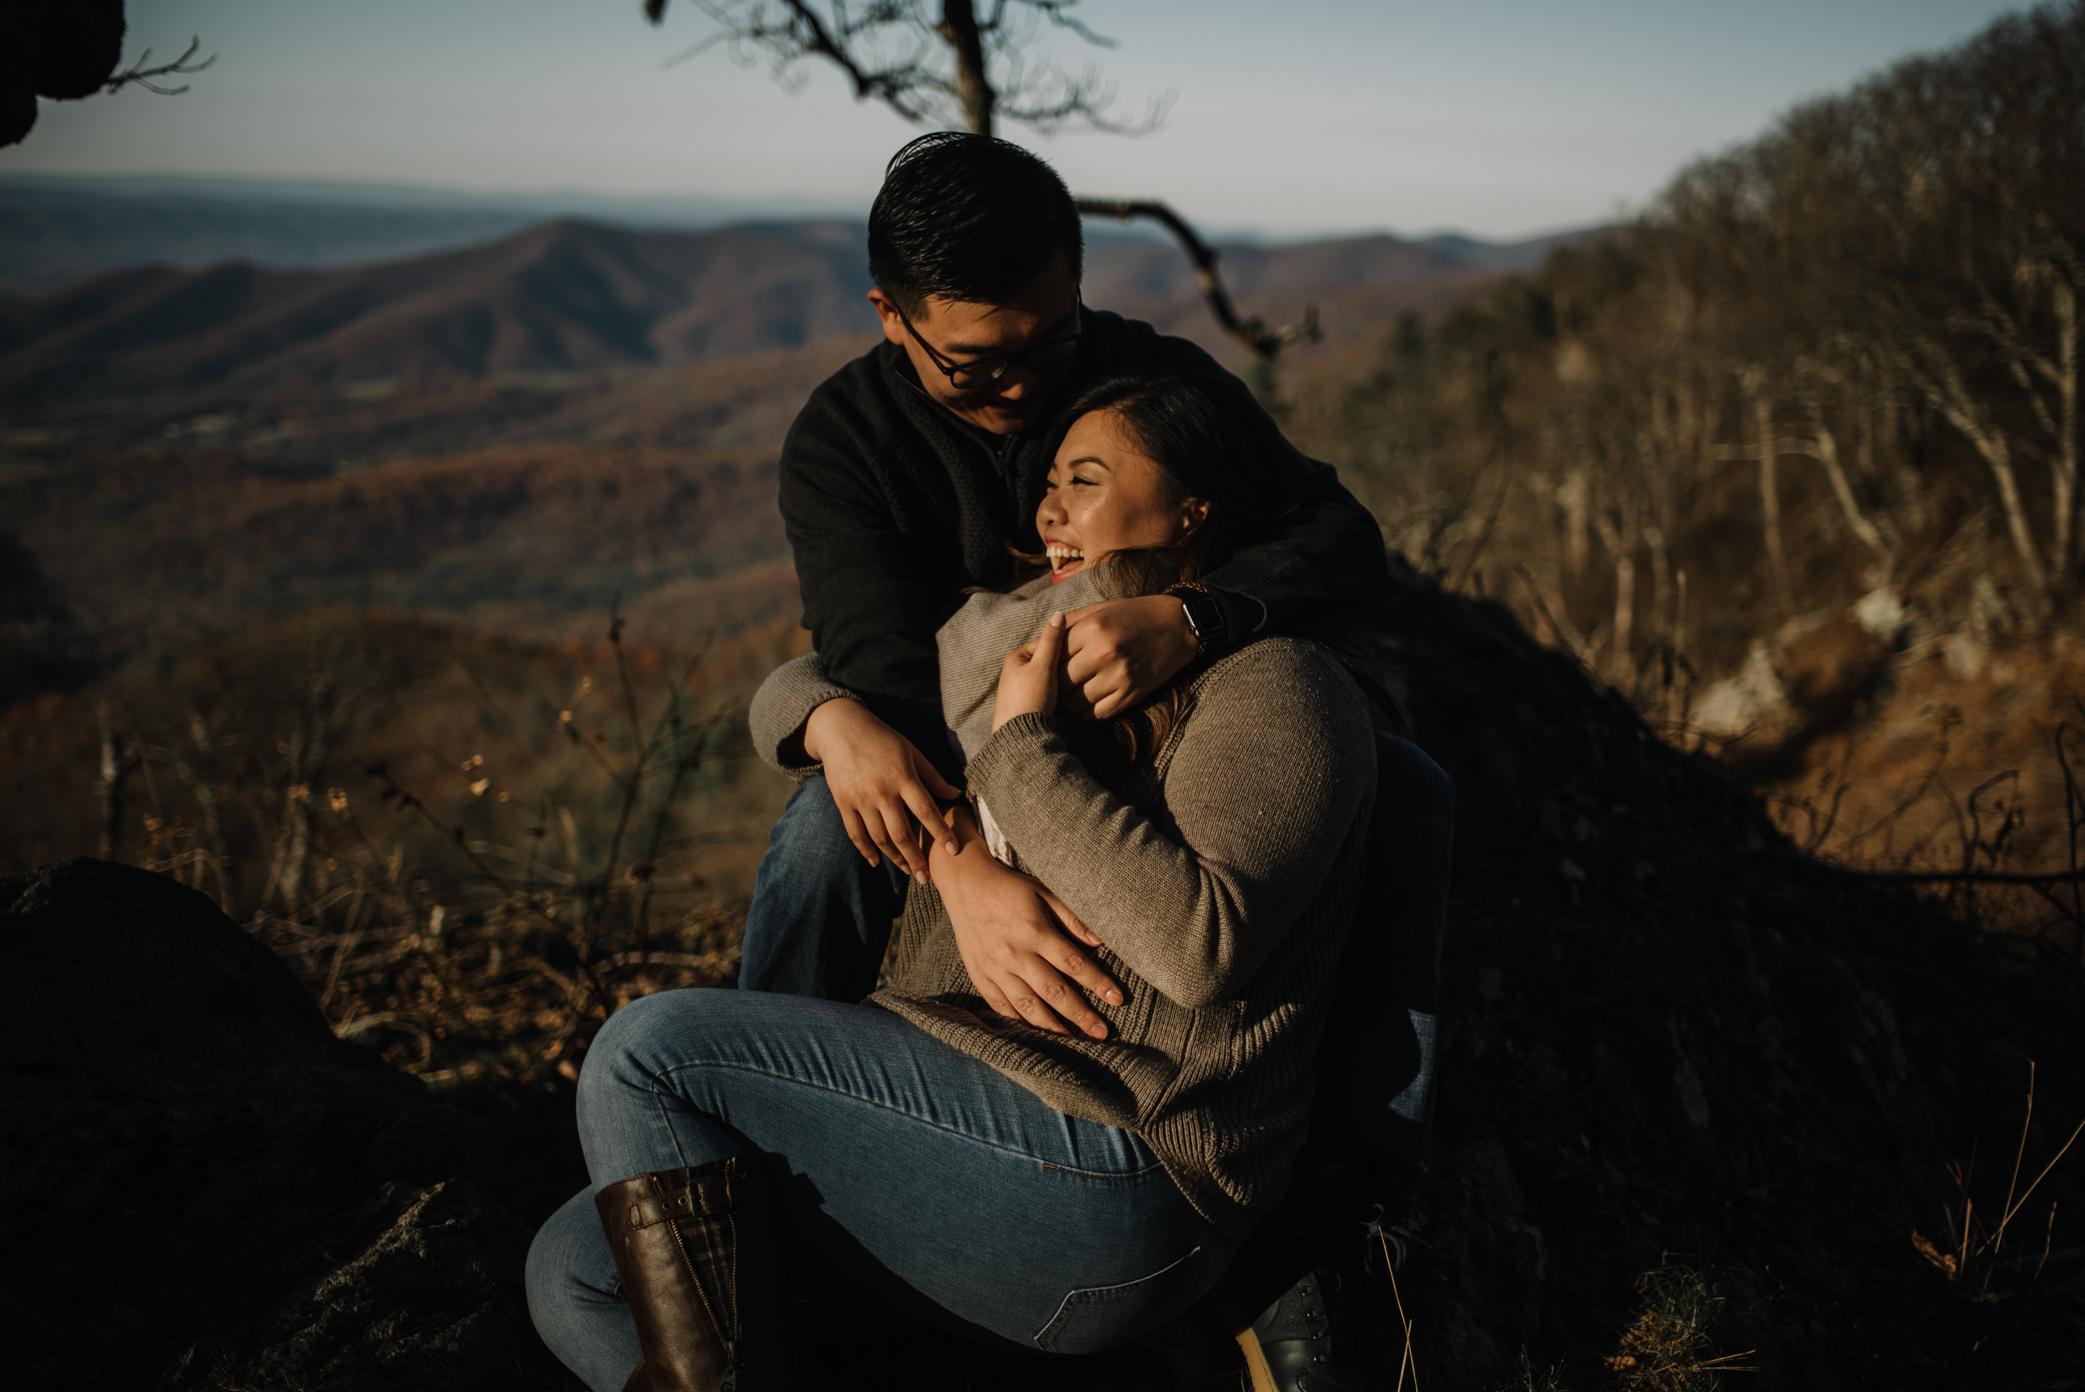 Joshua and Kristina - Shenandoah National Park - Skyline Drive - Winter Engagement Session Photographer - White Sails Creative_4.JPG